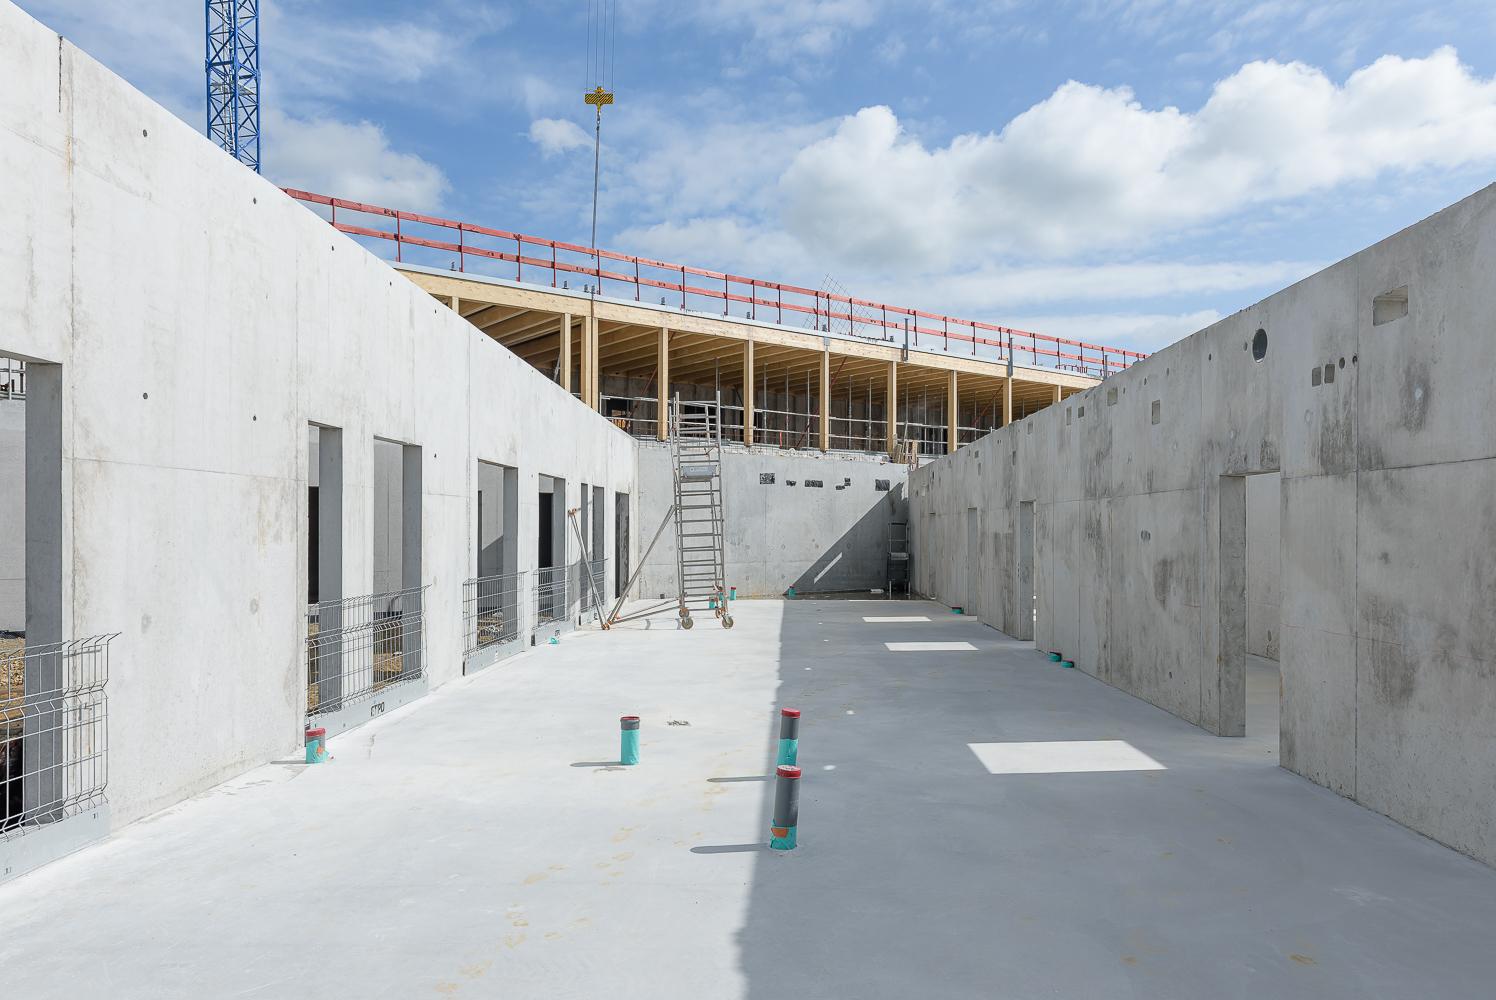 PAYSdeLOIRE-AIA-chantier-NsE-06-59